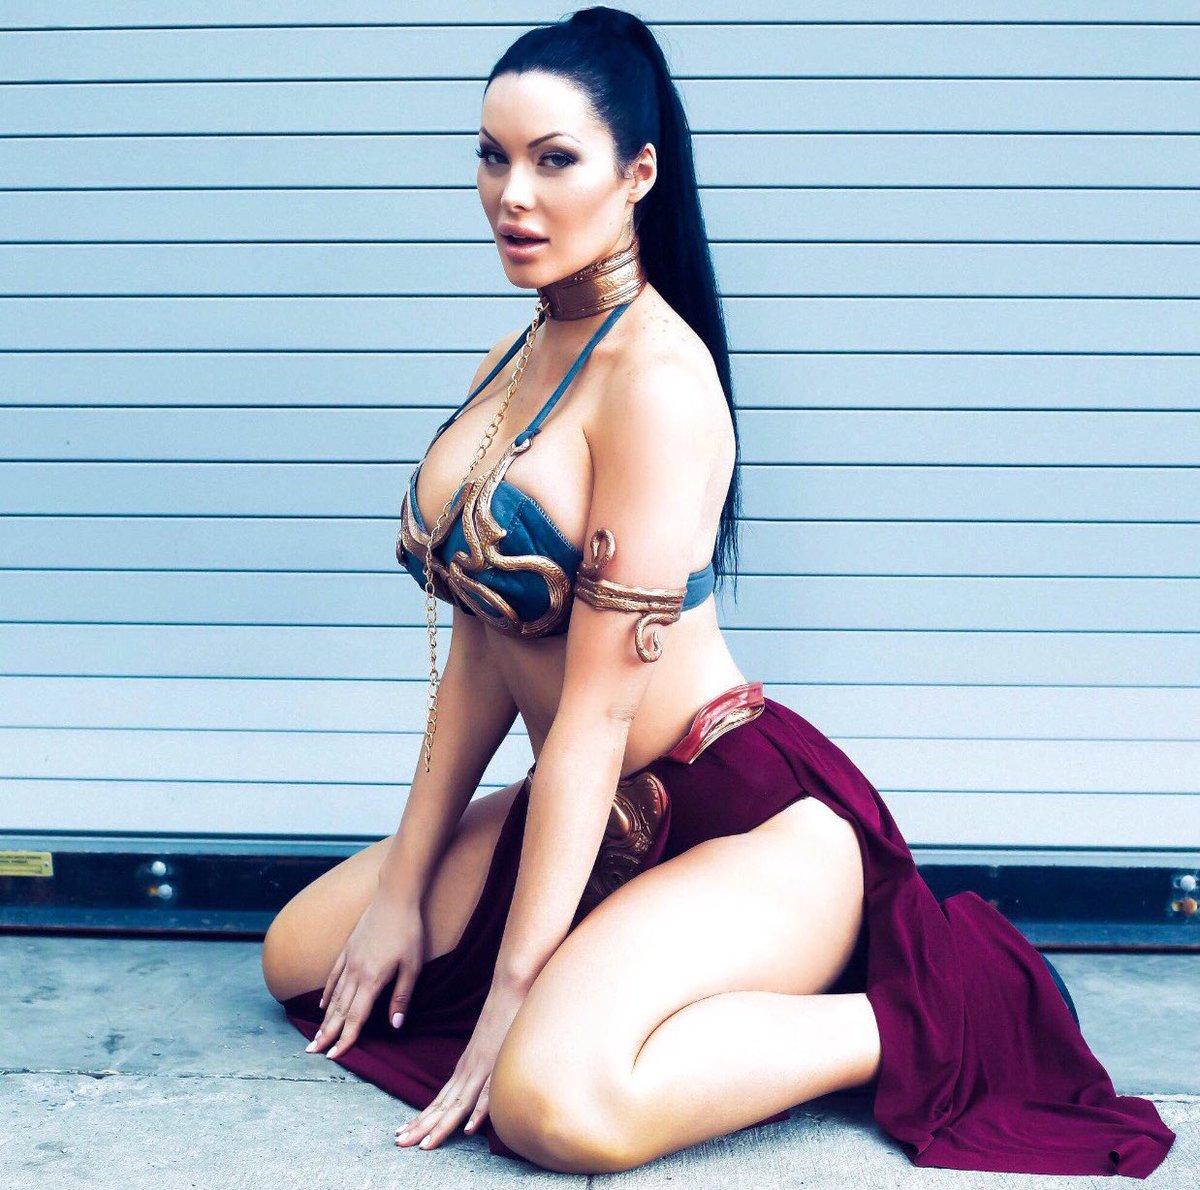 Topless Young Veronika Black naked photo 2017